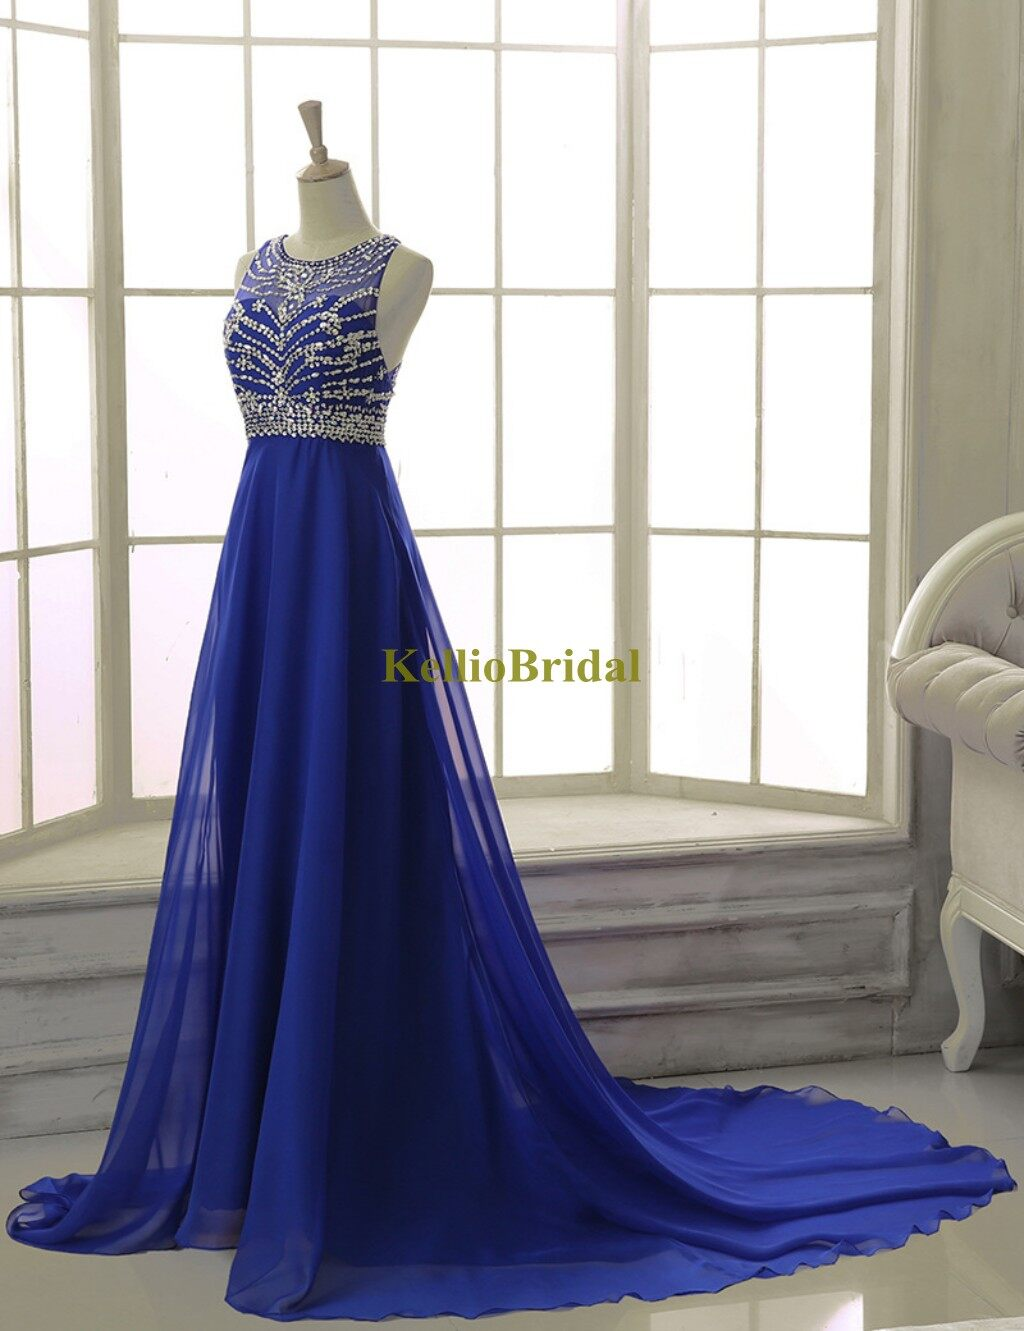 royal blue dress - 800×960